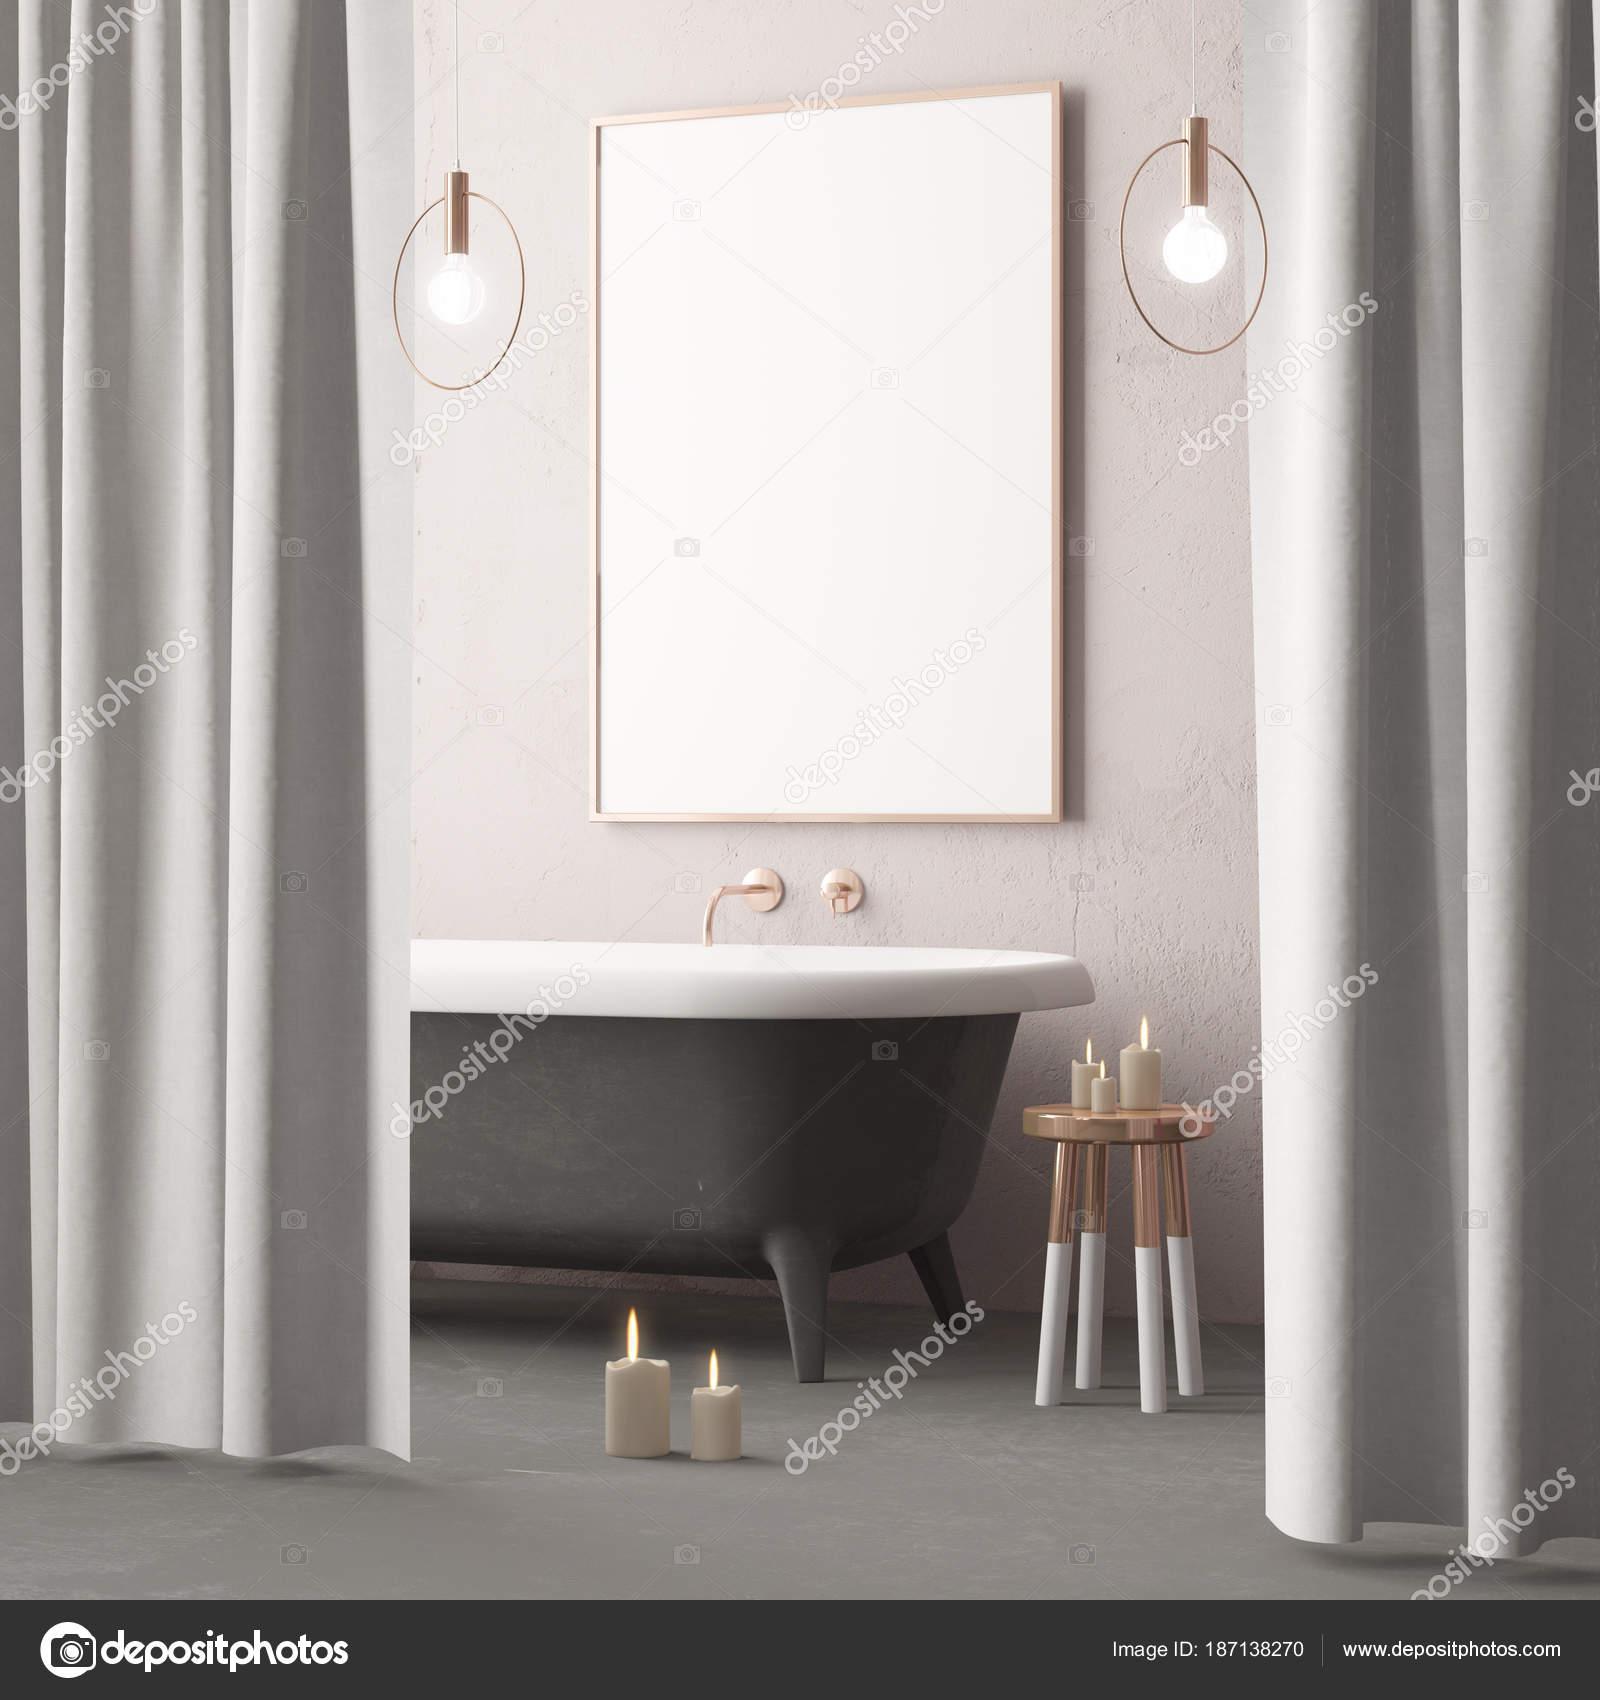 Fantastisch Mock Plakat Badezimmer Vintage Stil Trendfarbe U2014 Stockfoto